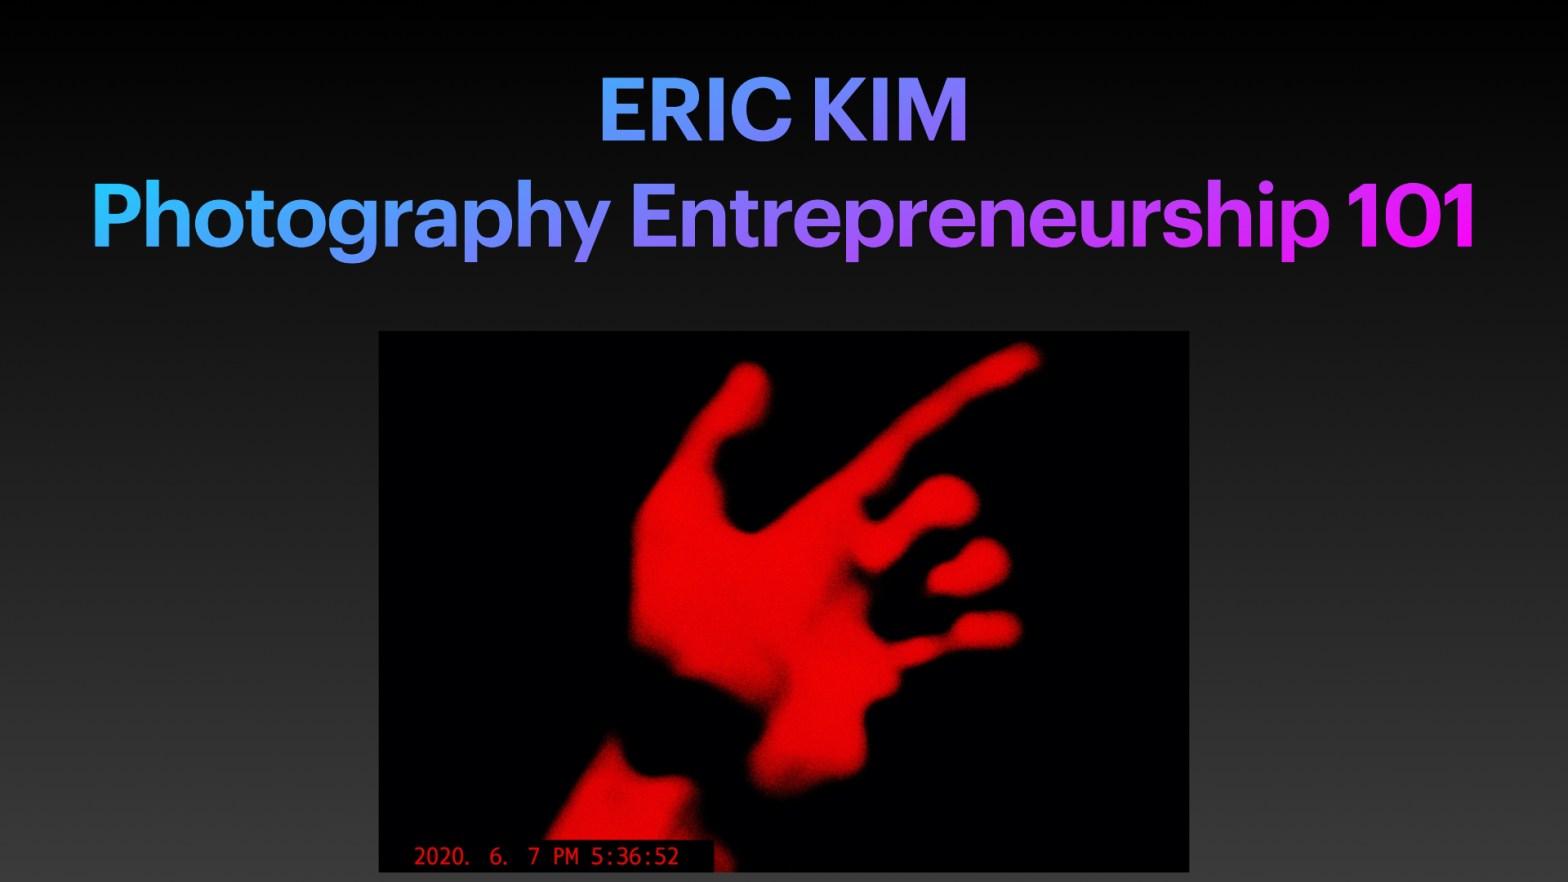 Photography Entrepreneurship 101 by ERIC KIM.001 title slide